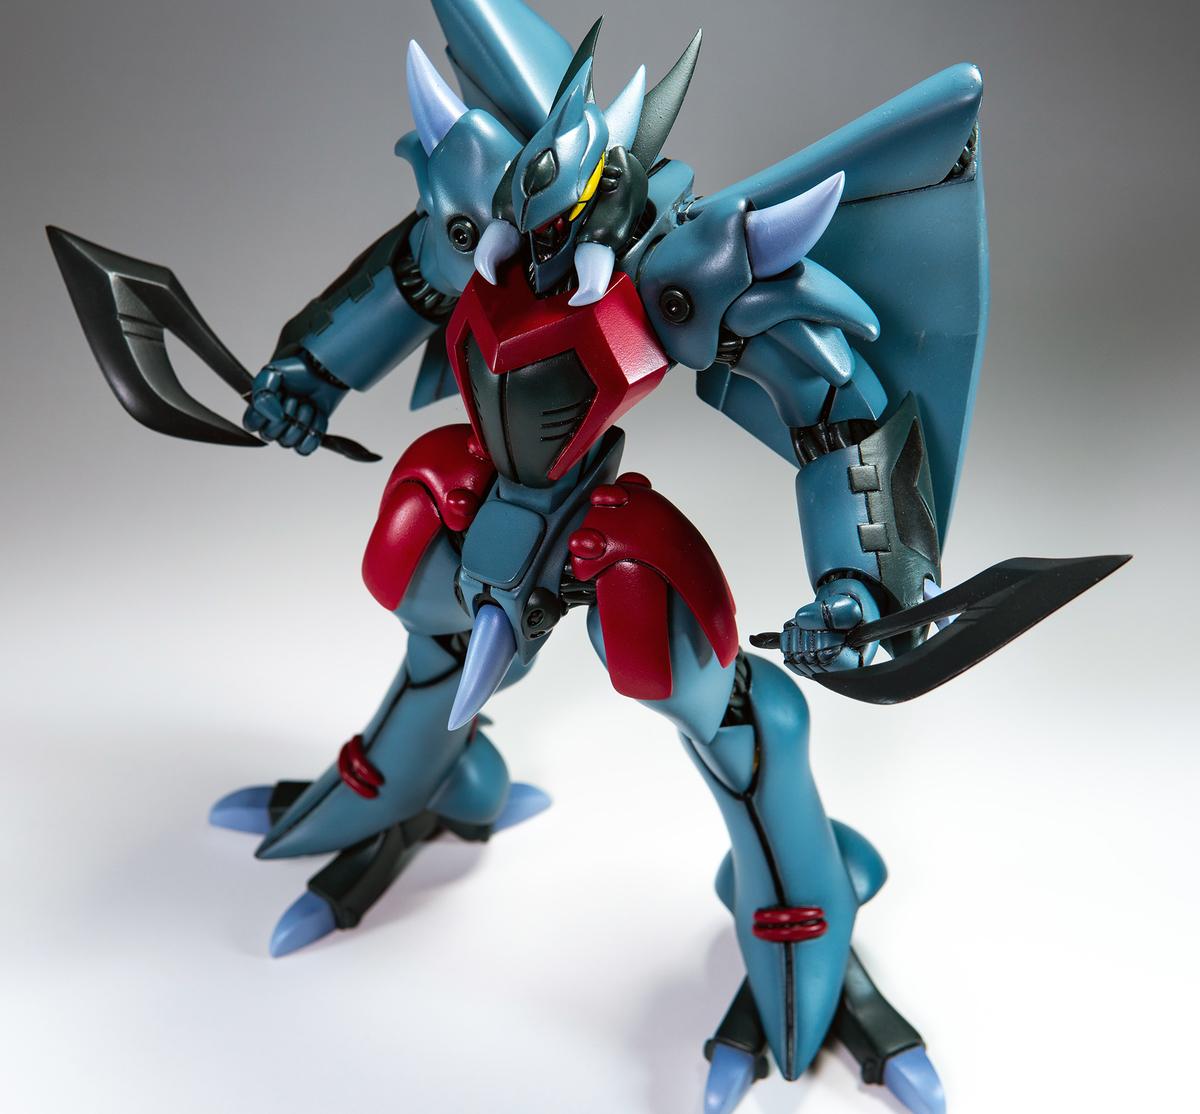 f:id:hiroban-ch:20210408205656j:plain